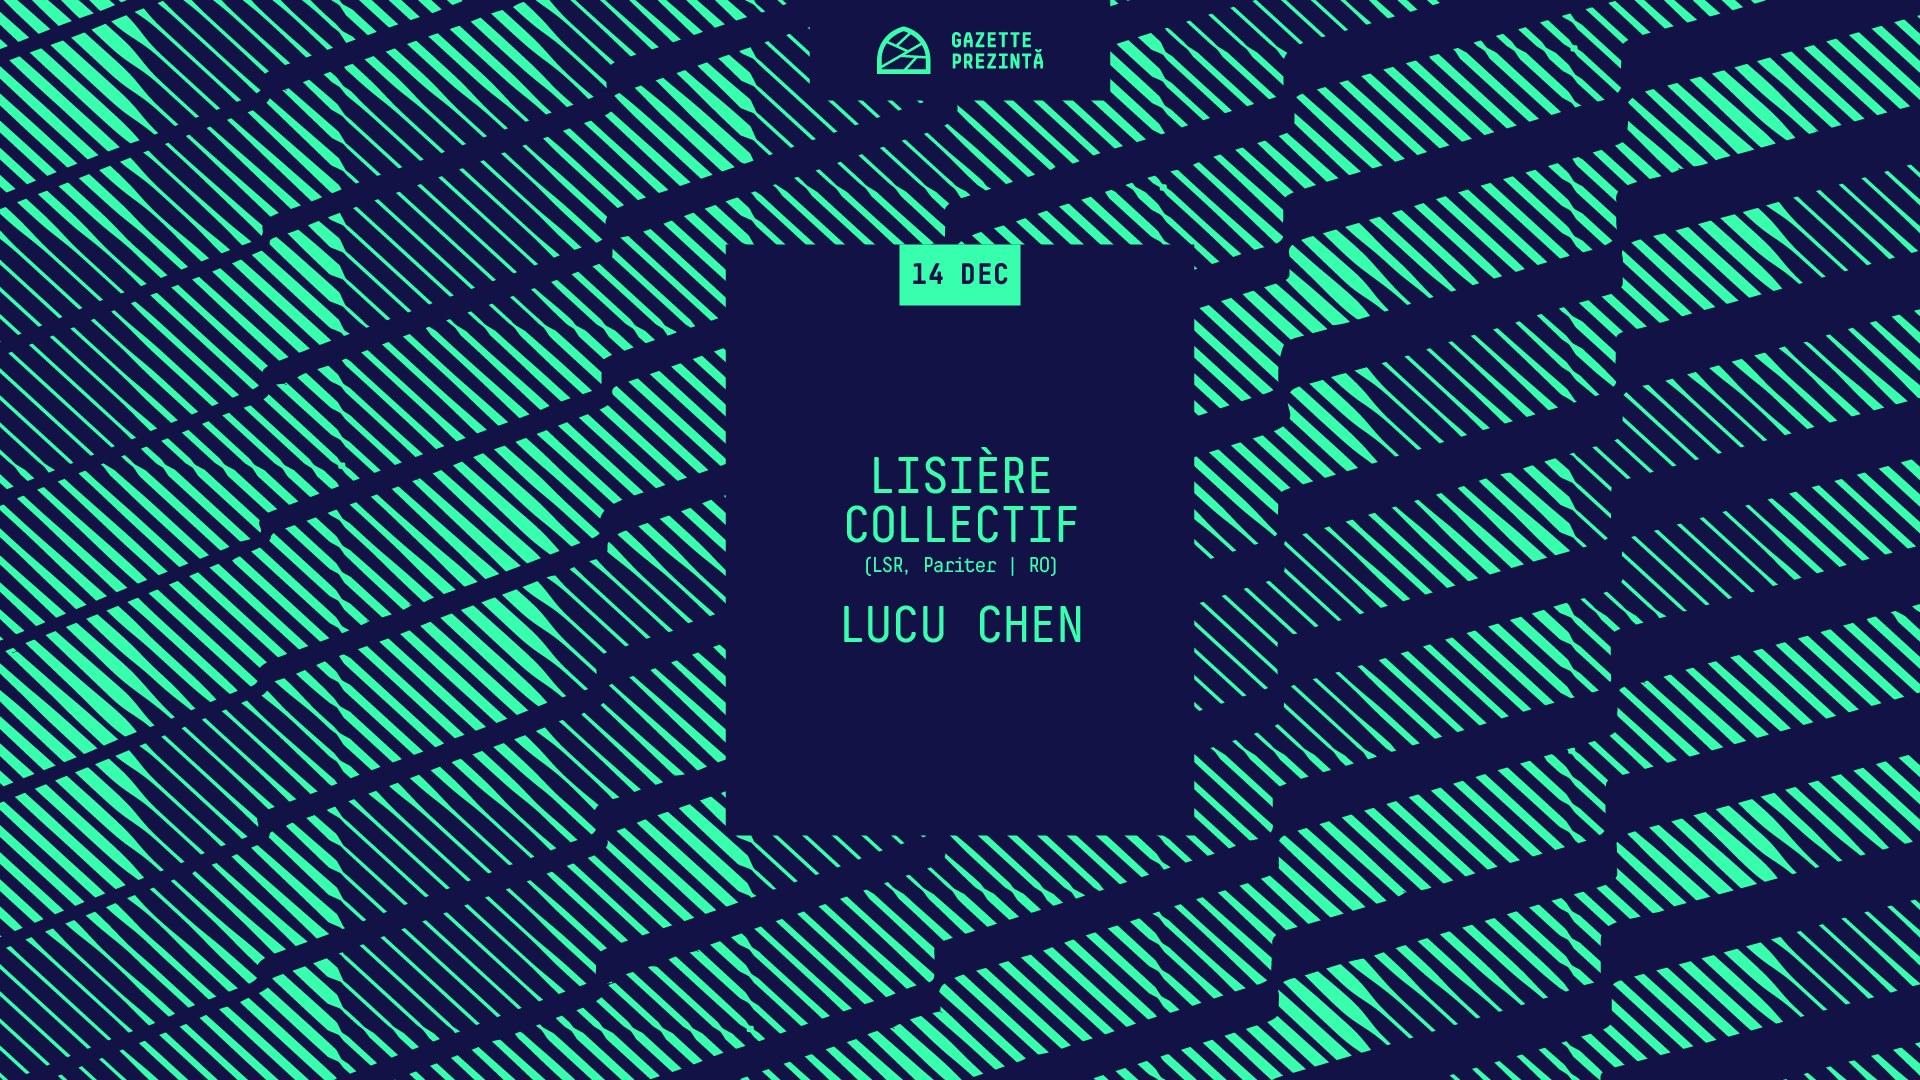 Gazette Prezintă: Lisière Collectif / Lucu Chen